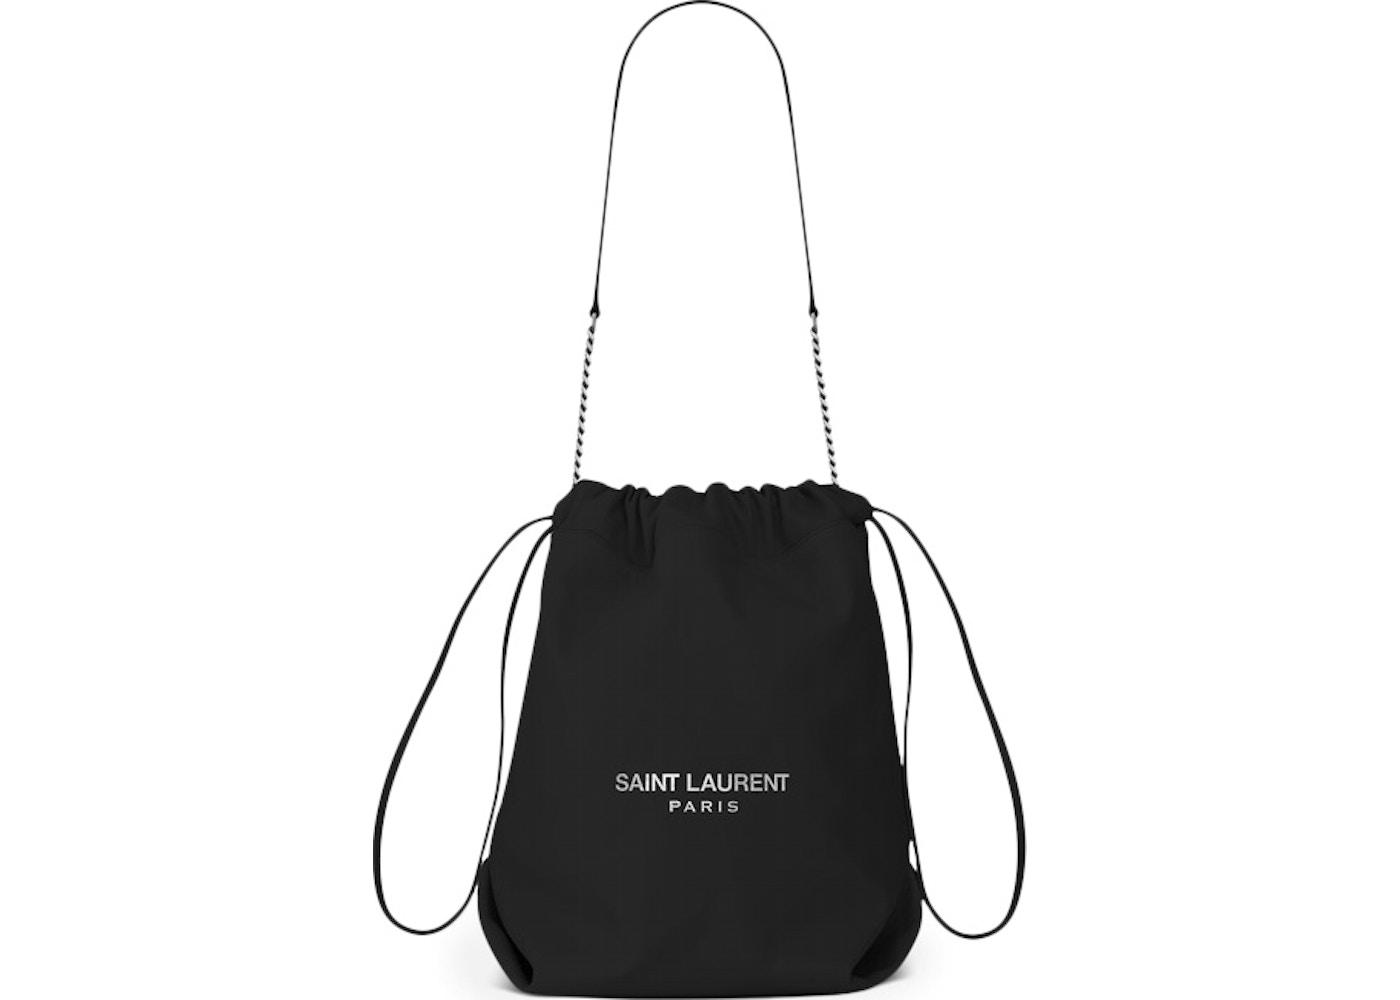 Saint Laurent Teddy Drawstring Bag Smooth Leather Black. Smooth Leather  Black 6f0dd8abb0808